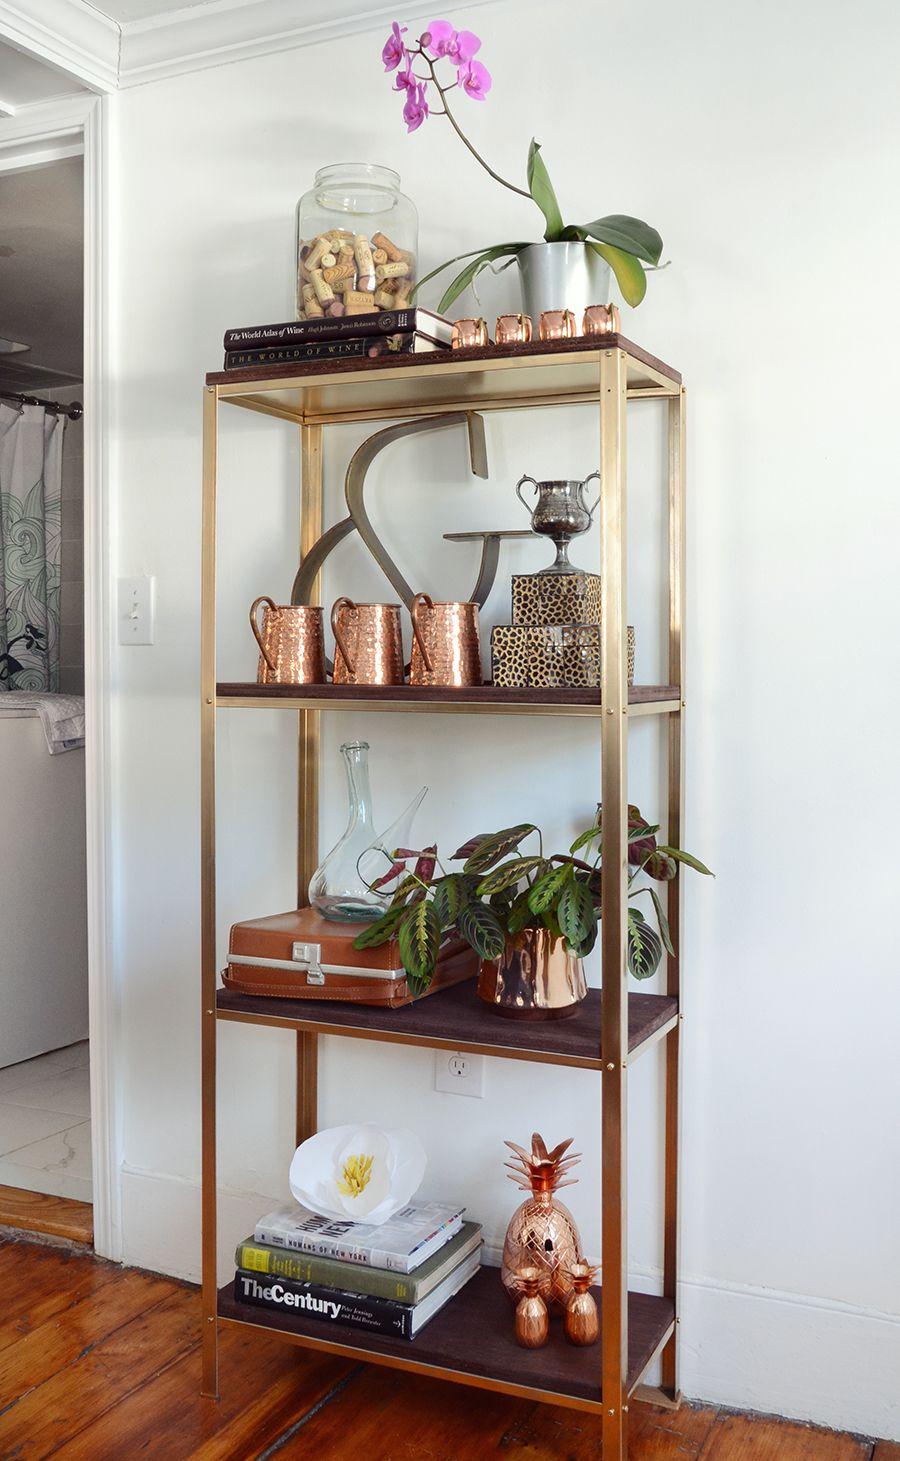 Ikea Hack A Utilitarian Shelf Goes Rustic Glam Ikea Diy Diy